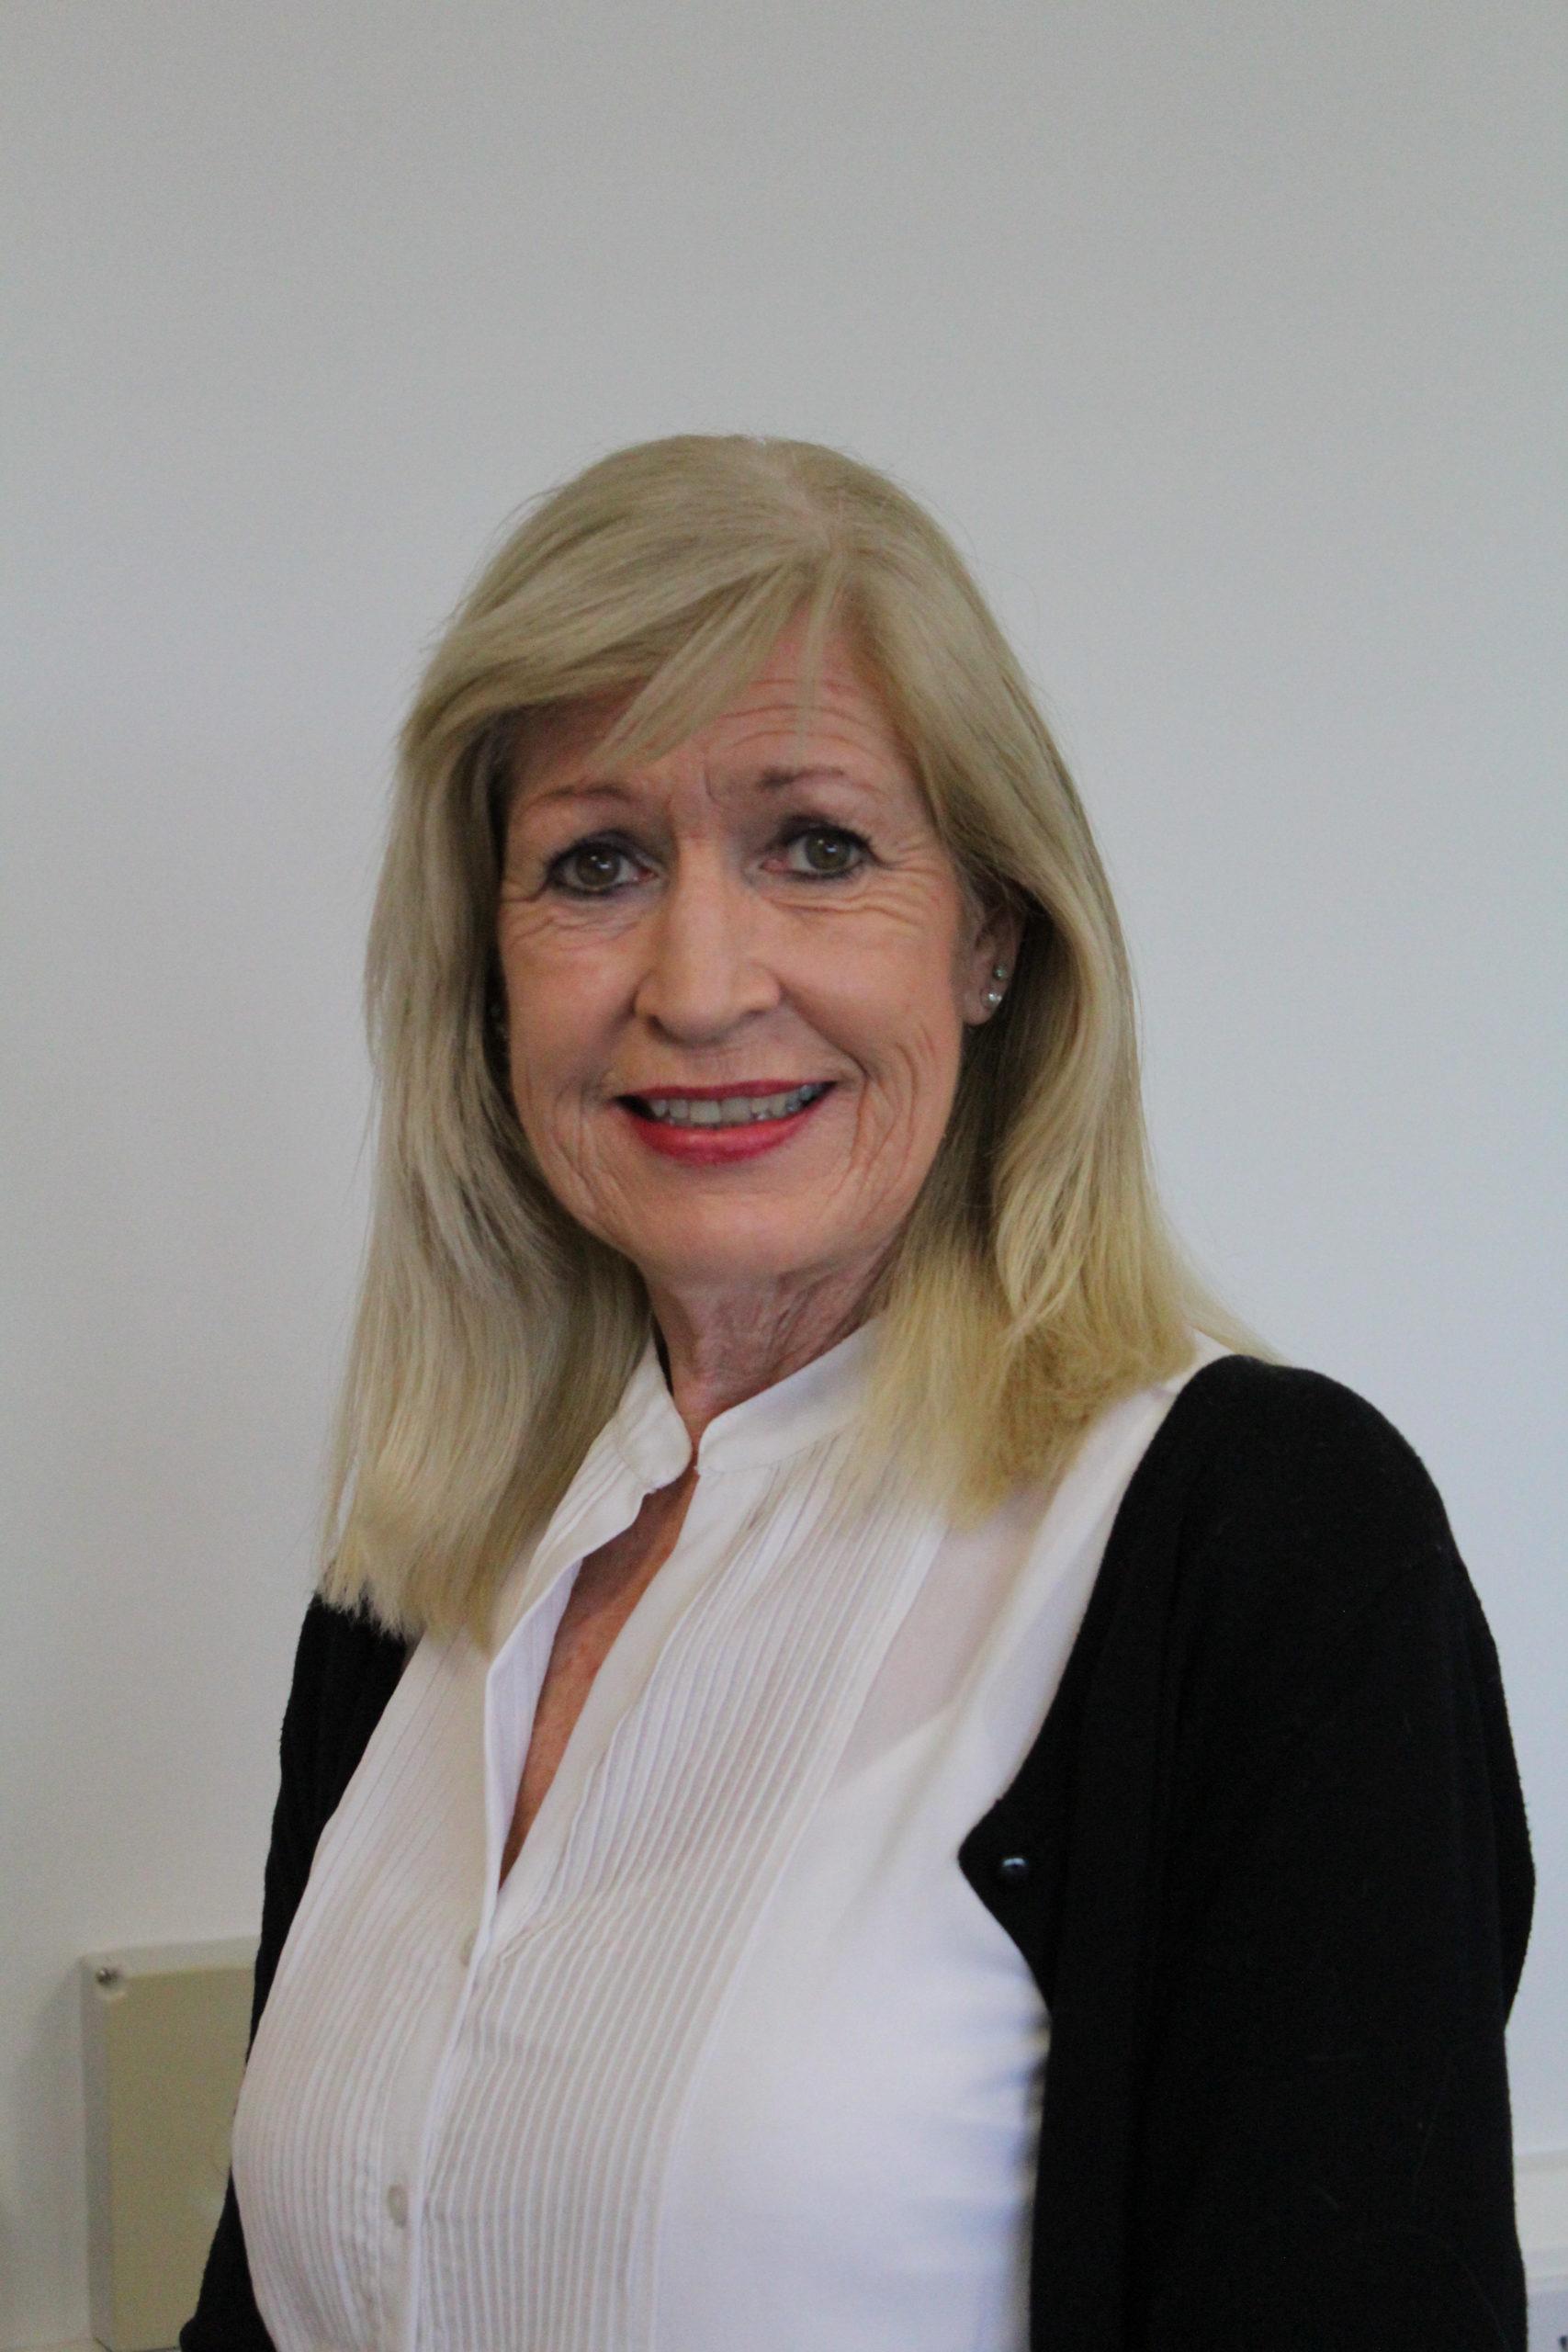 Paulette Conroy